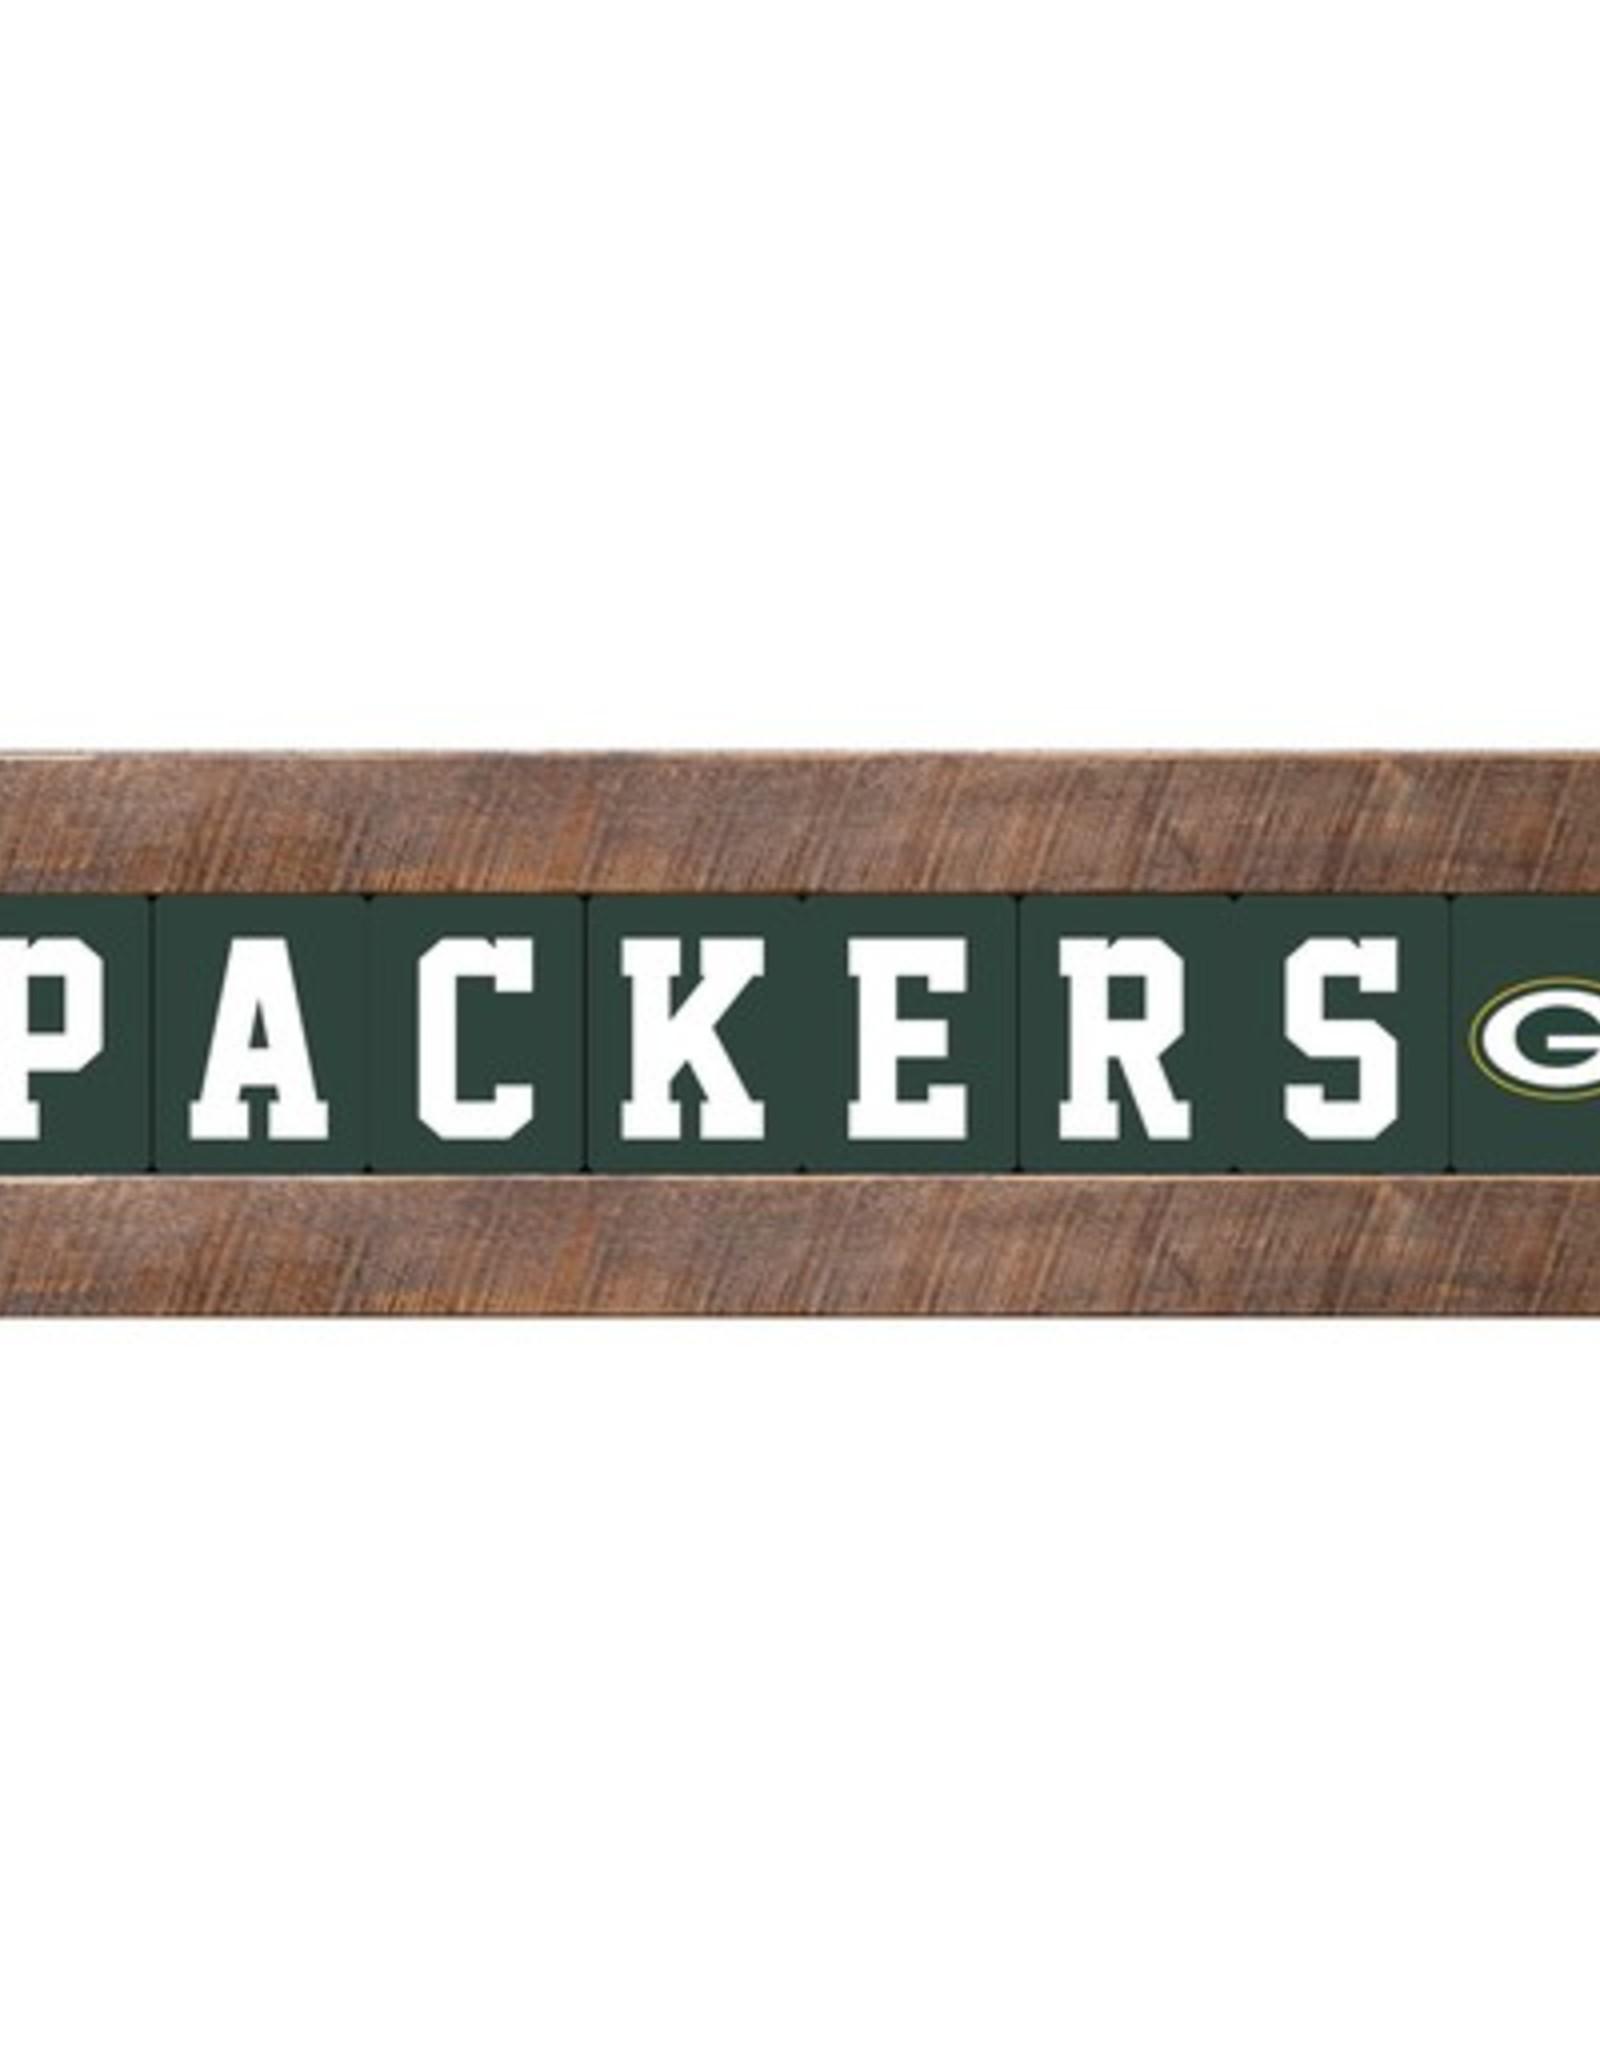 RUSTIC MARLIN Green Bay Packers Marlin Classic Wood Sign